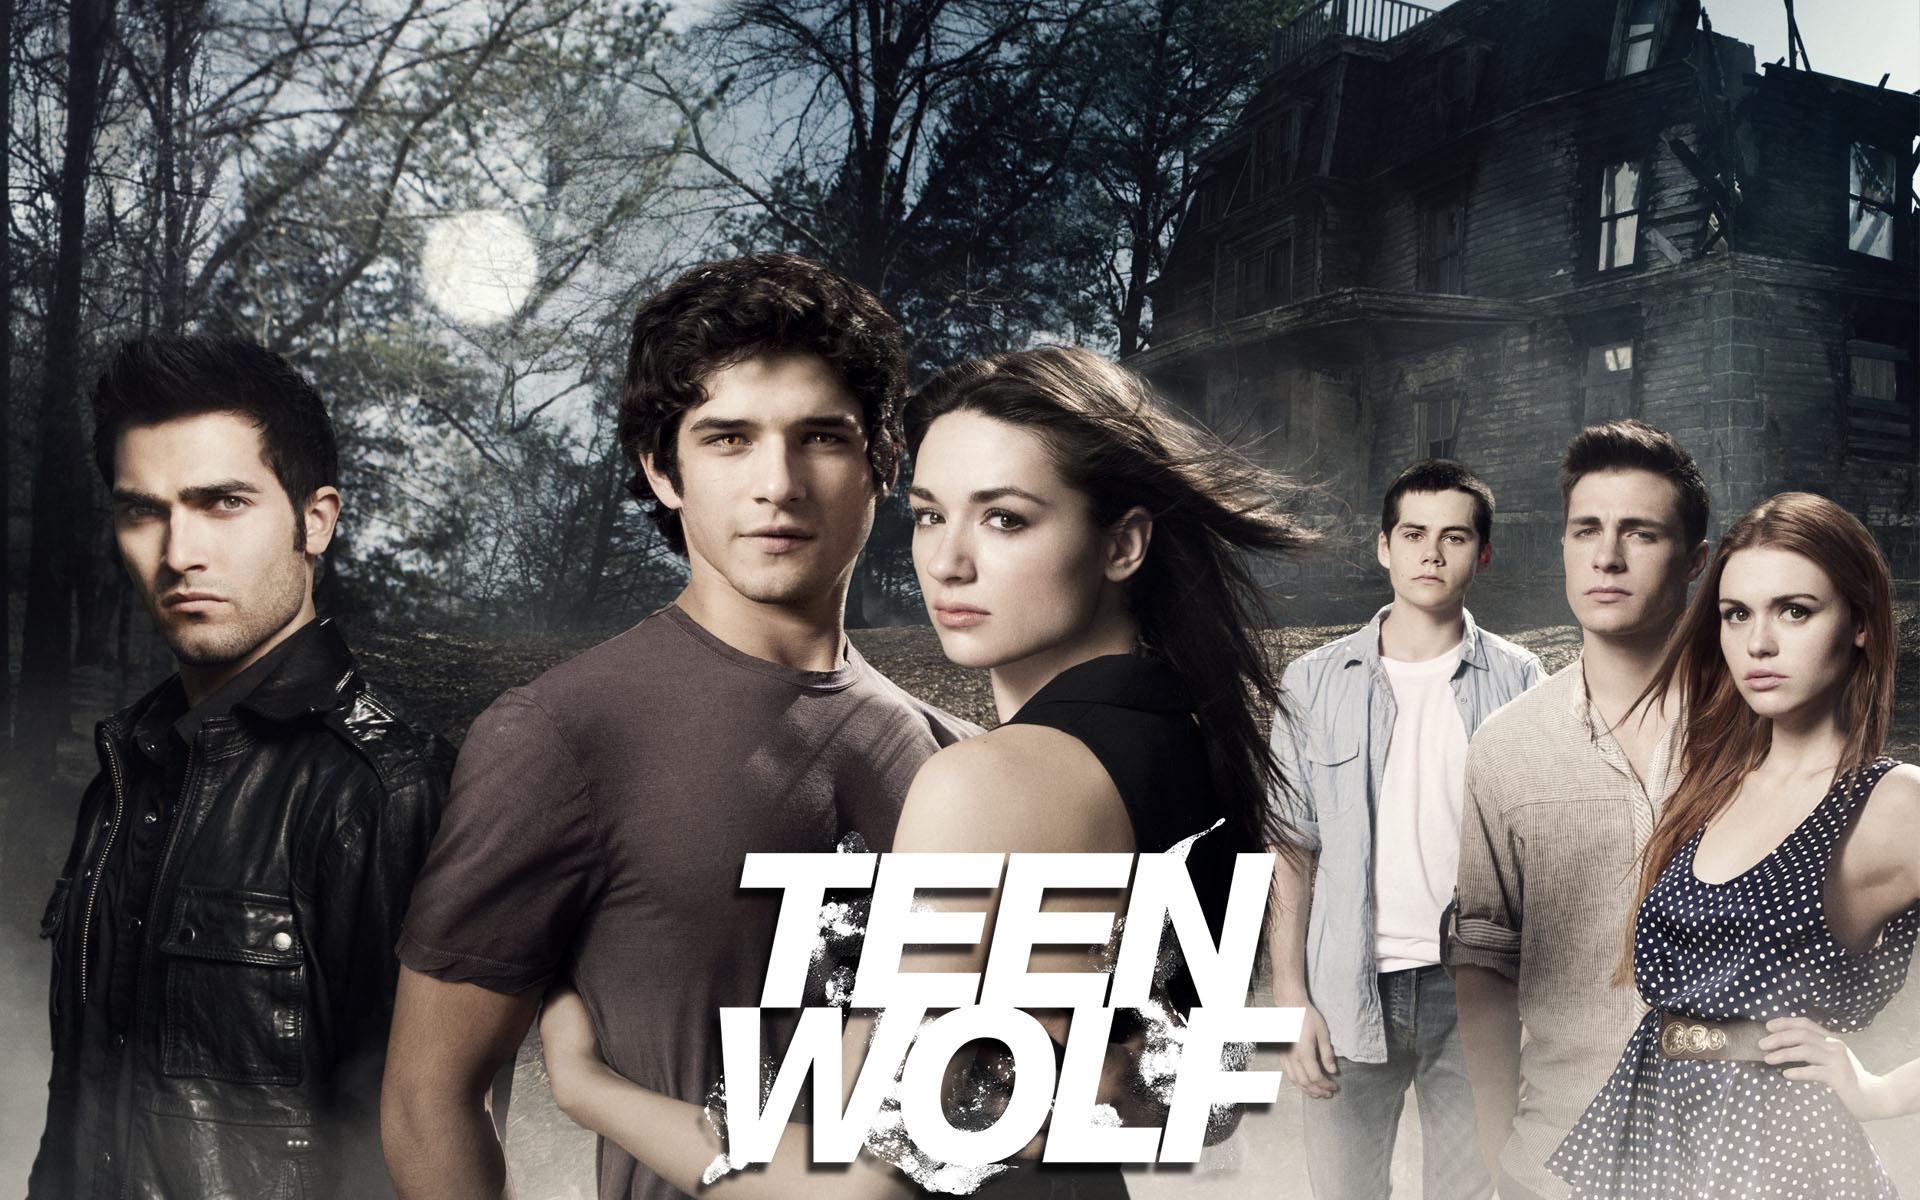 Teen Wolf Wallpapers - Teen Wolf Background Laptop , HD Wallpaper & Backgrounds